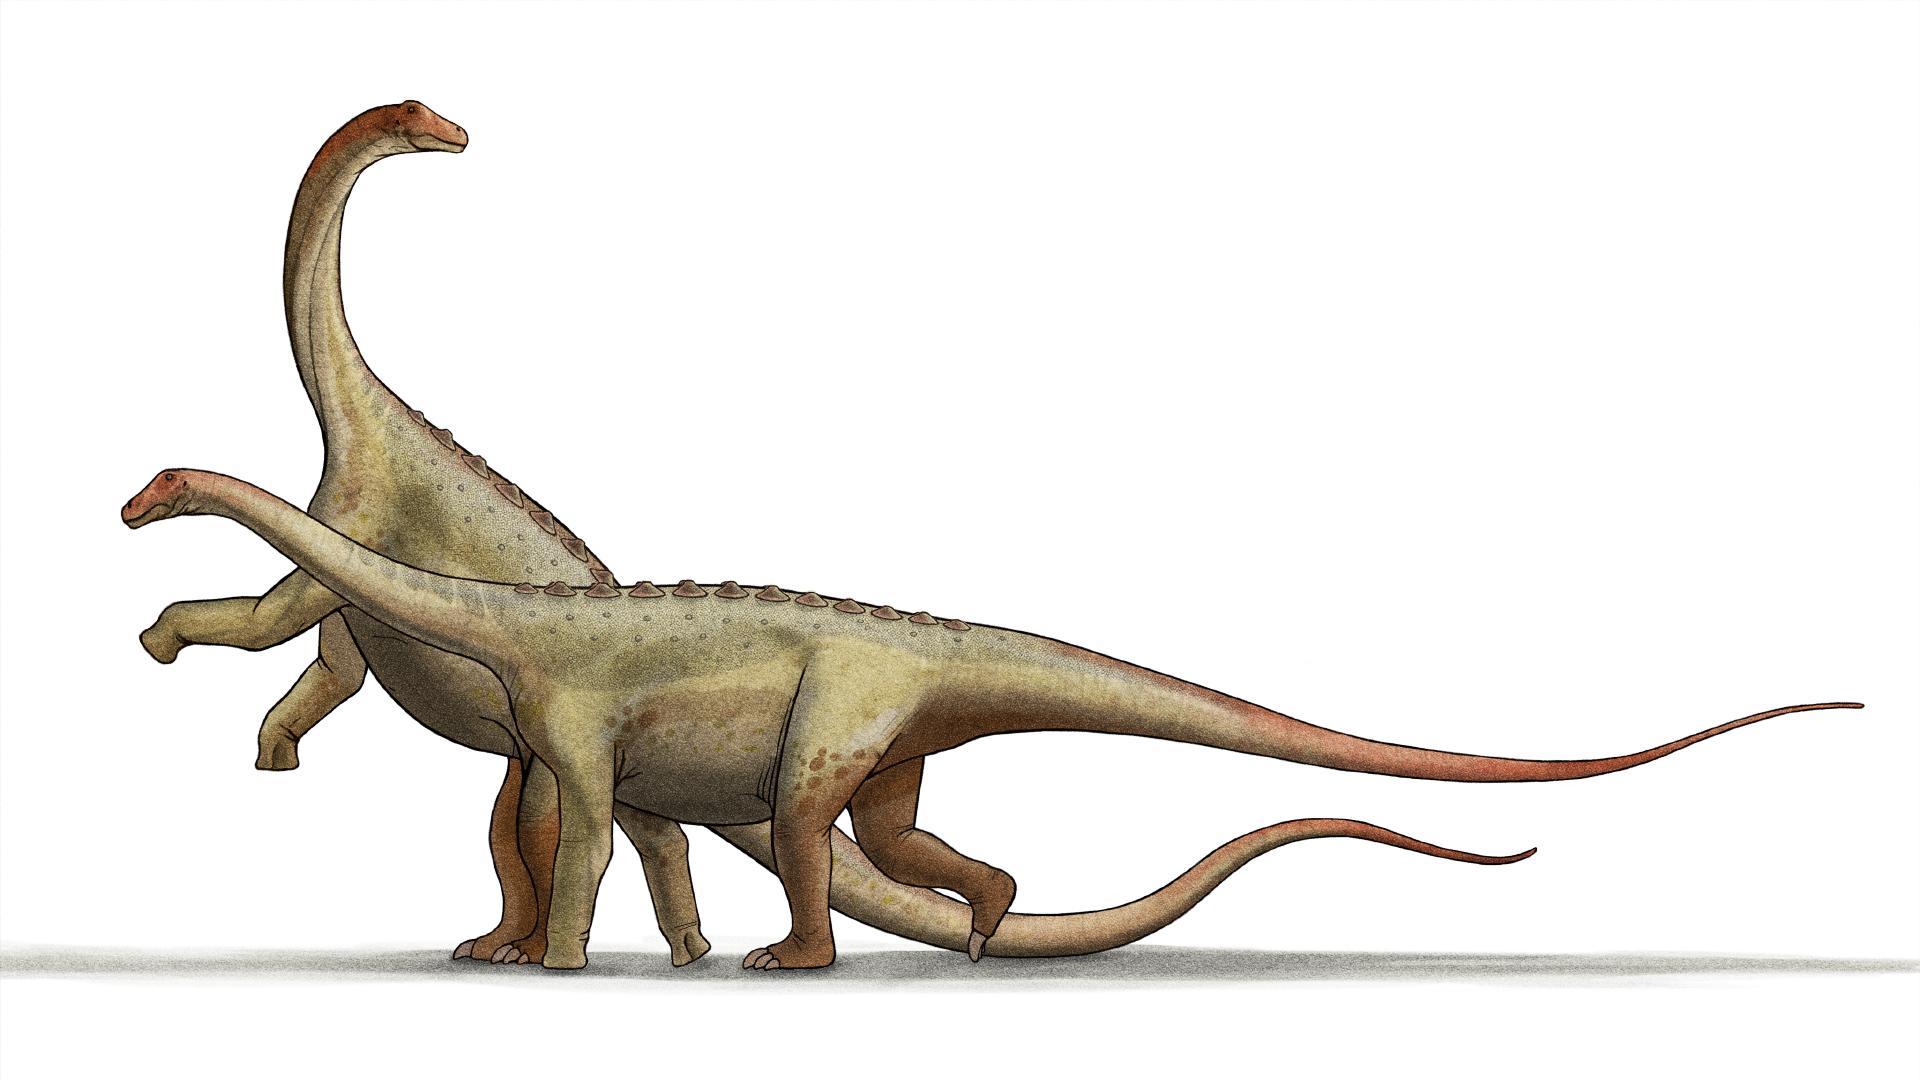 File Saltasaurus Dinosaur Png Wikipedia Green dinosaur illustration, tyrannosaurus dinosaur spinosaurus cartoon, cartoon dinosaur transparent background png clipart. file saltasaurus dinosaur png wikipedia